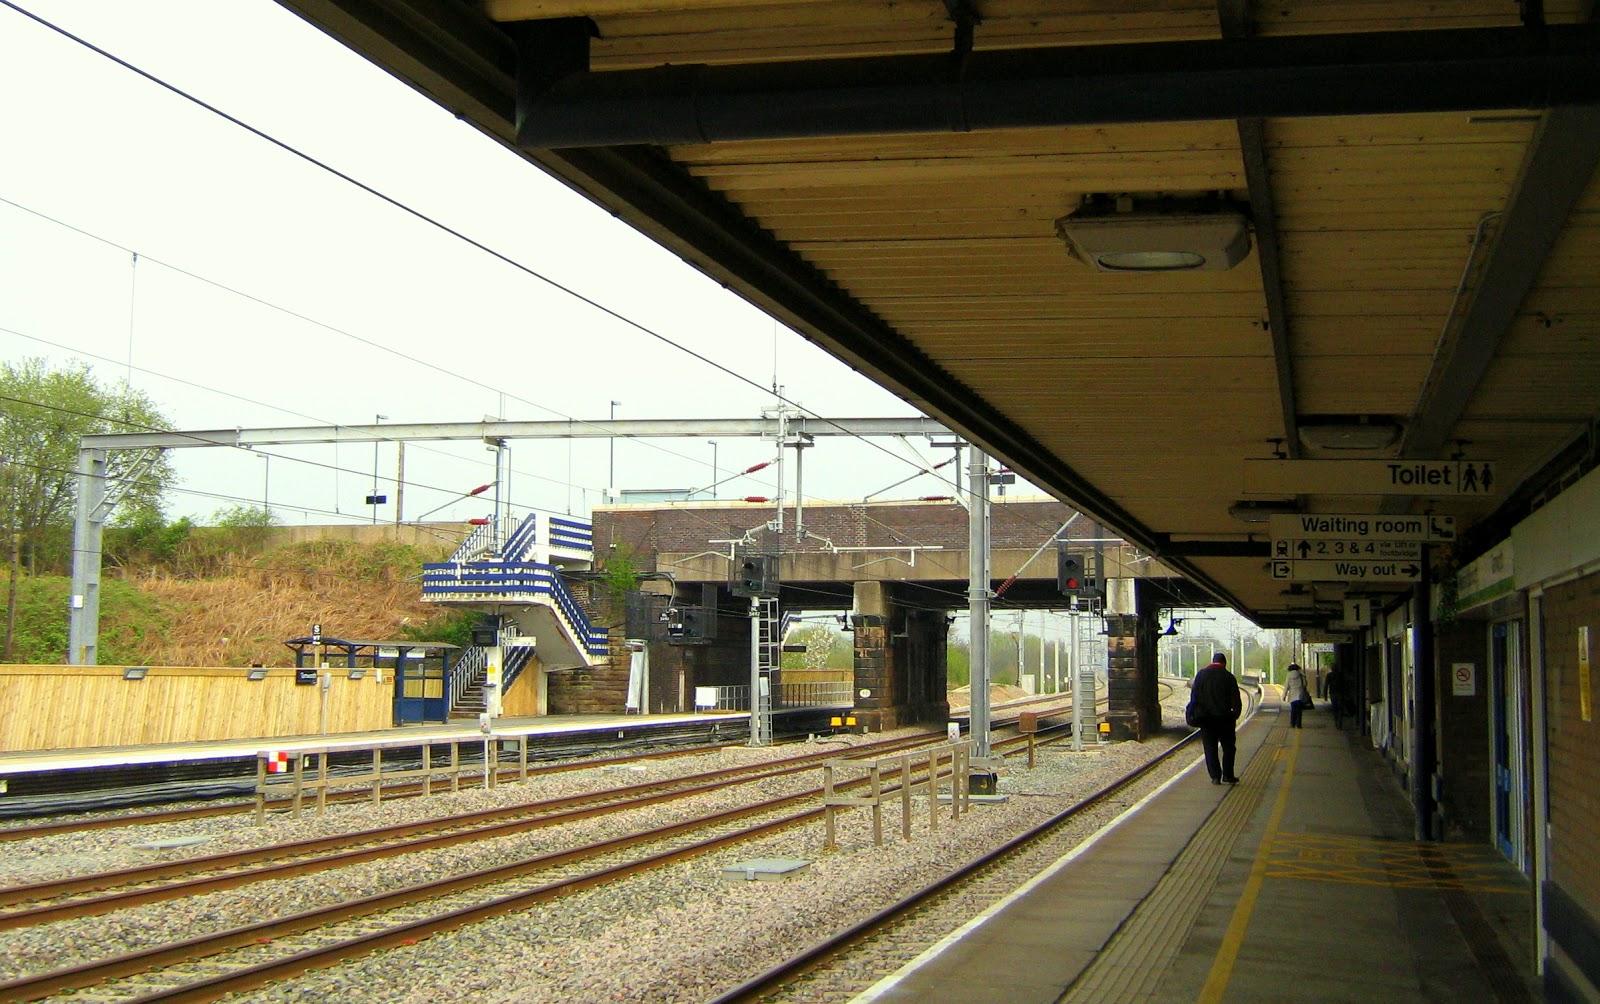 Tamworth Railway station